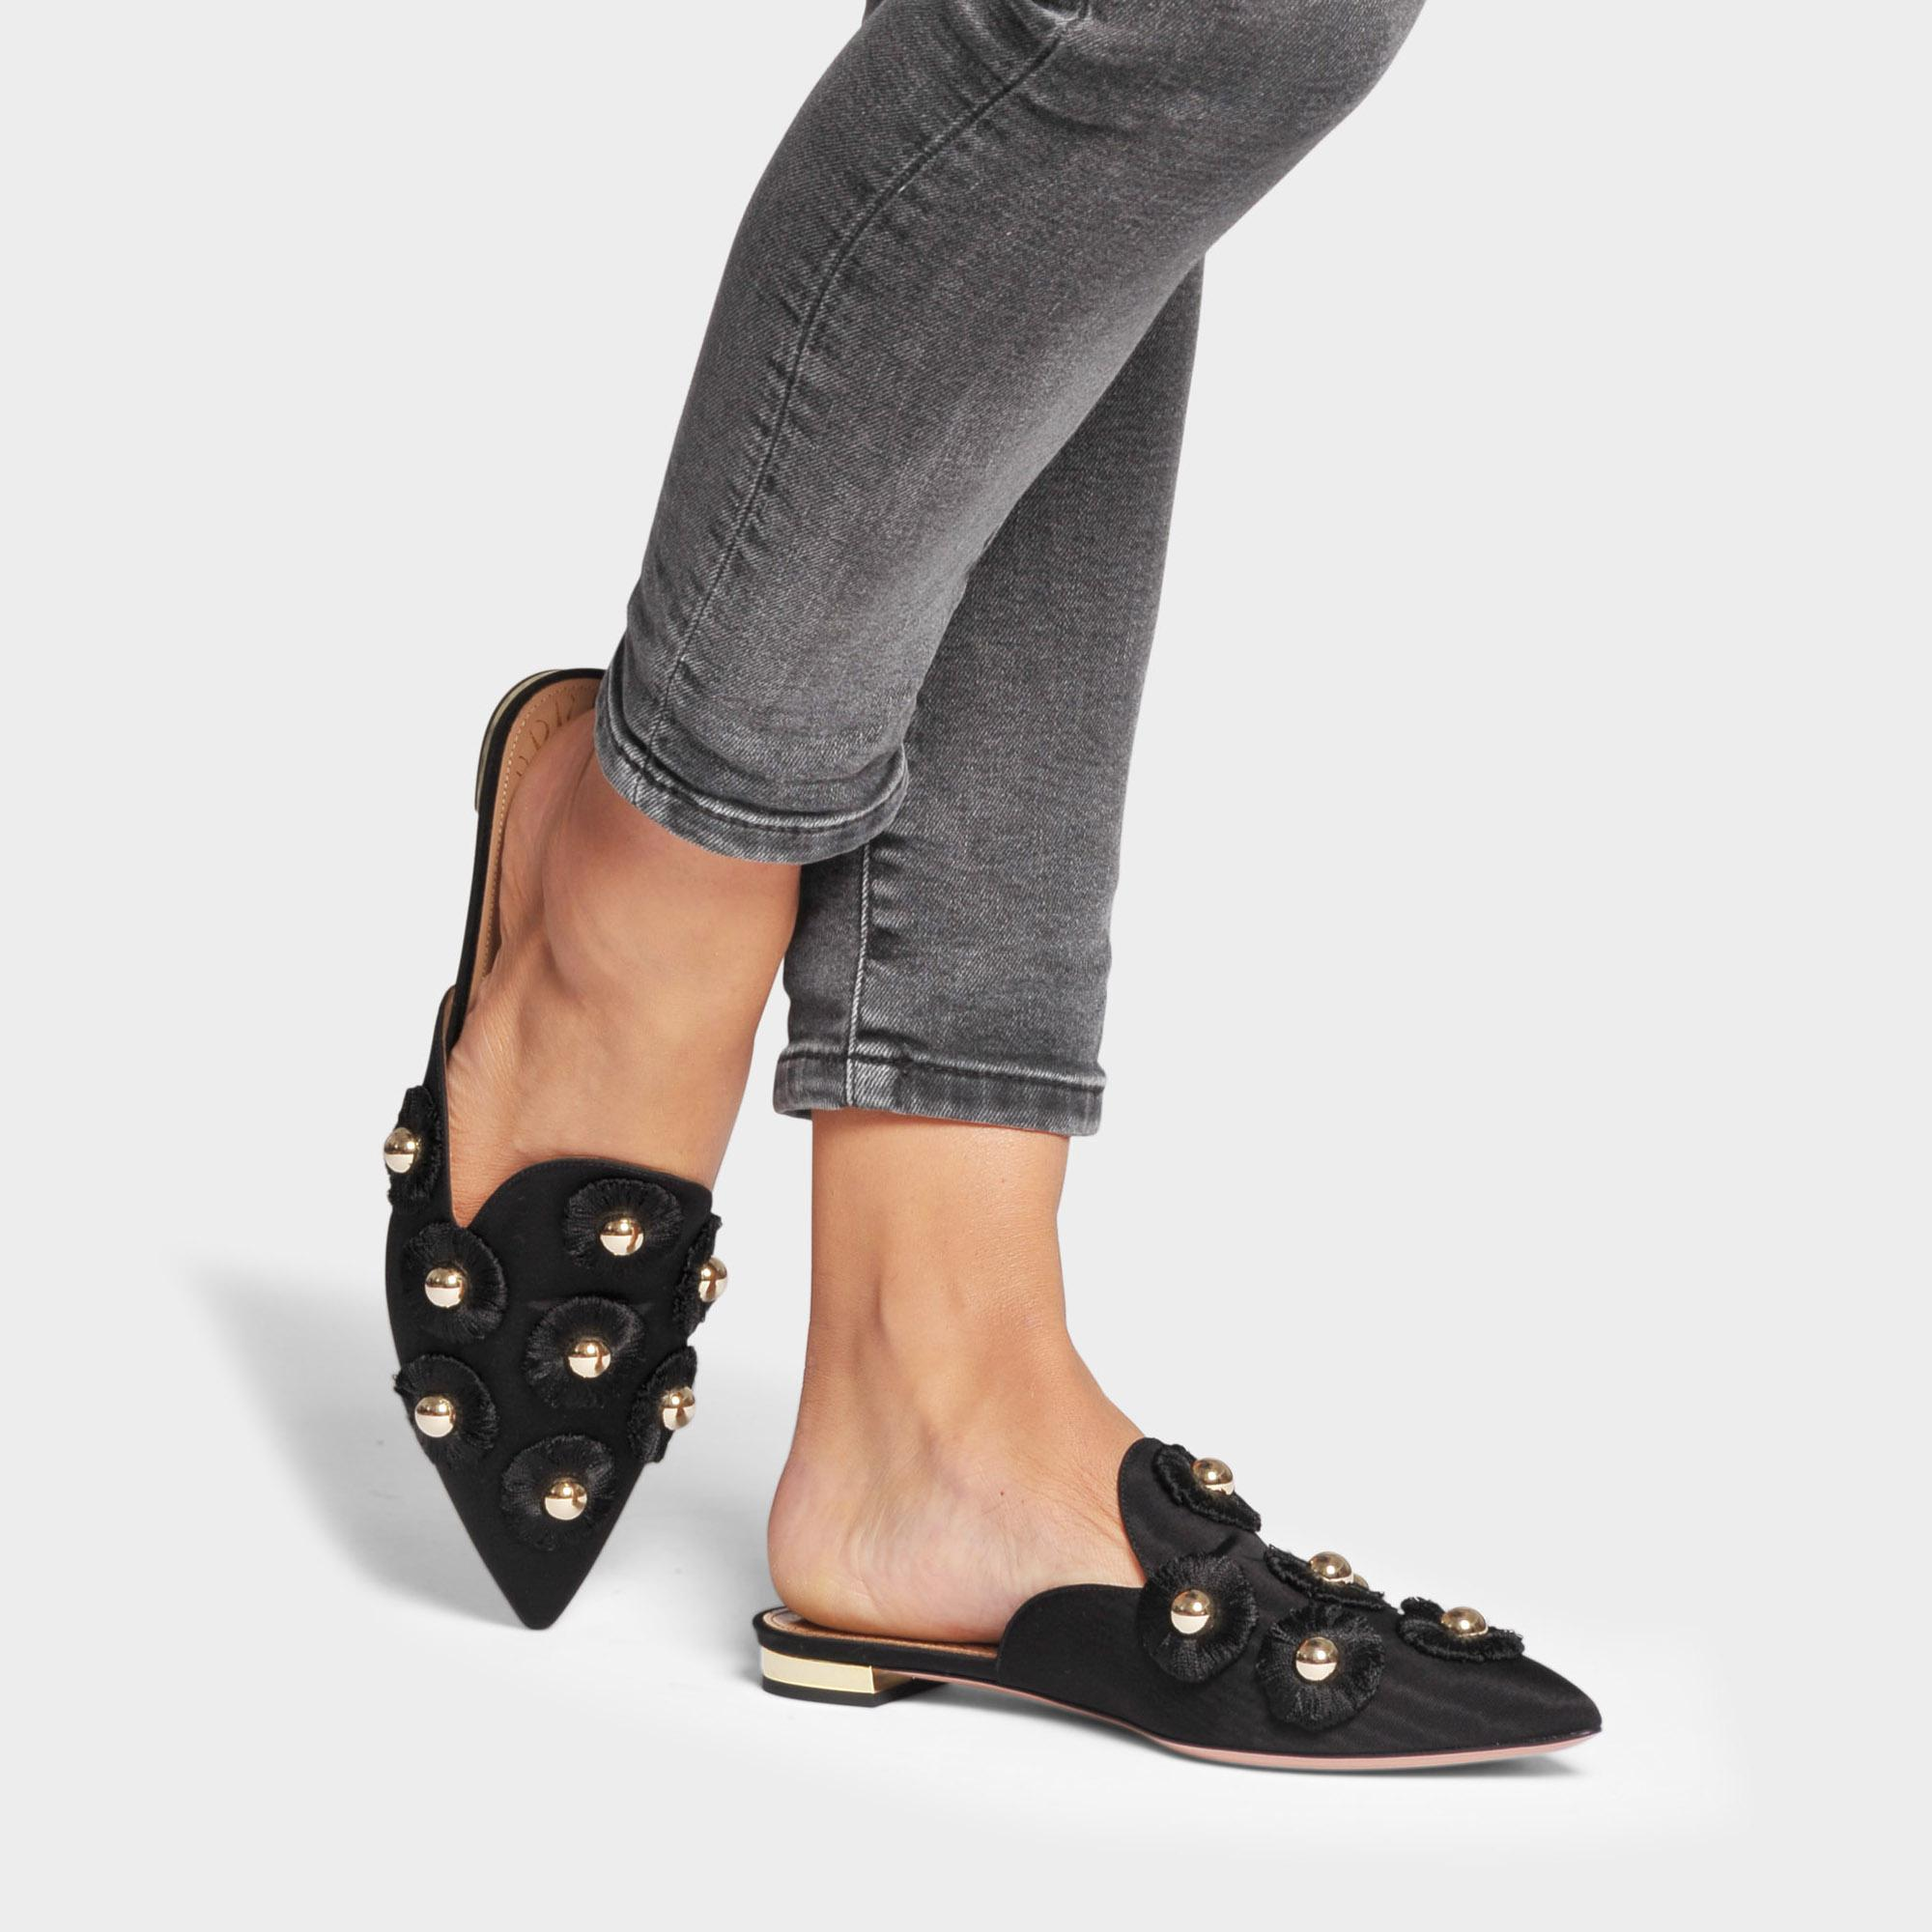 info for f0a71 7c334 aquazzura--Sunflower-Flat-Shoes-In-Black-Moire-Fabric.jpeg